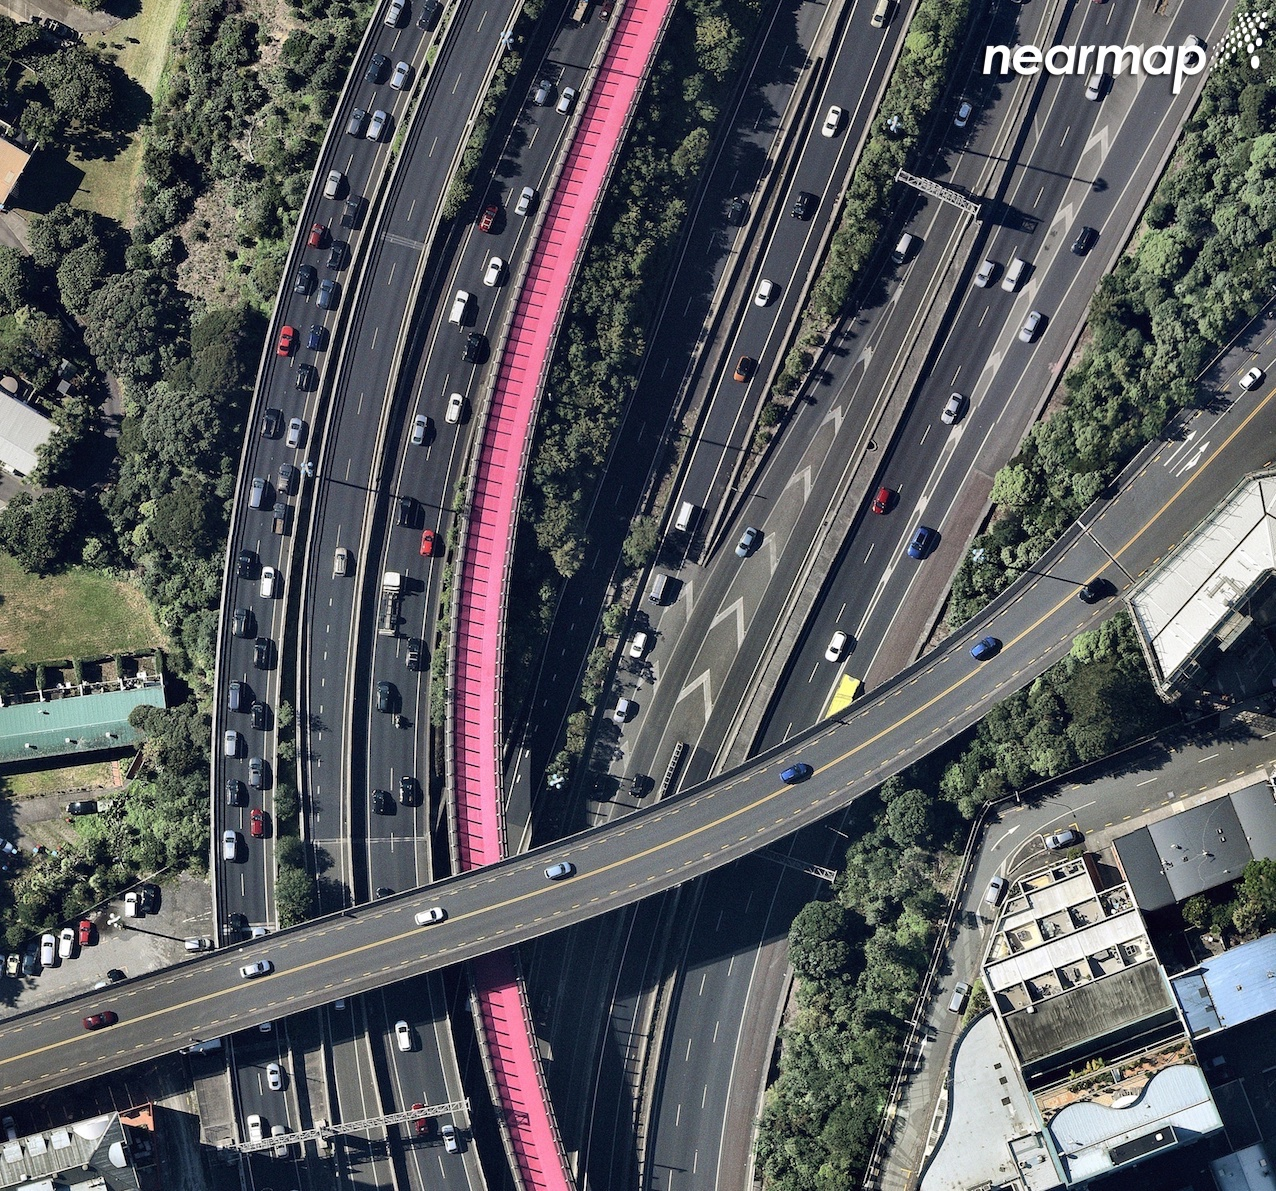 Auckland's Lightpath as captured by Nearmap.